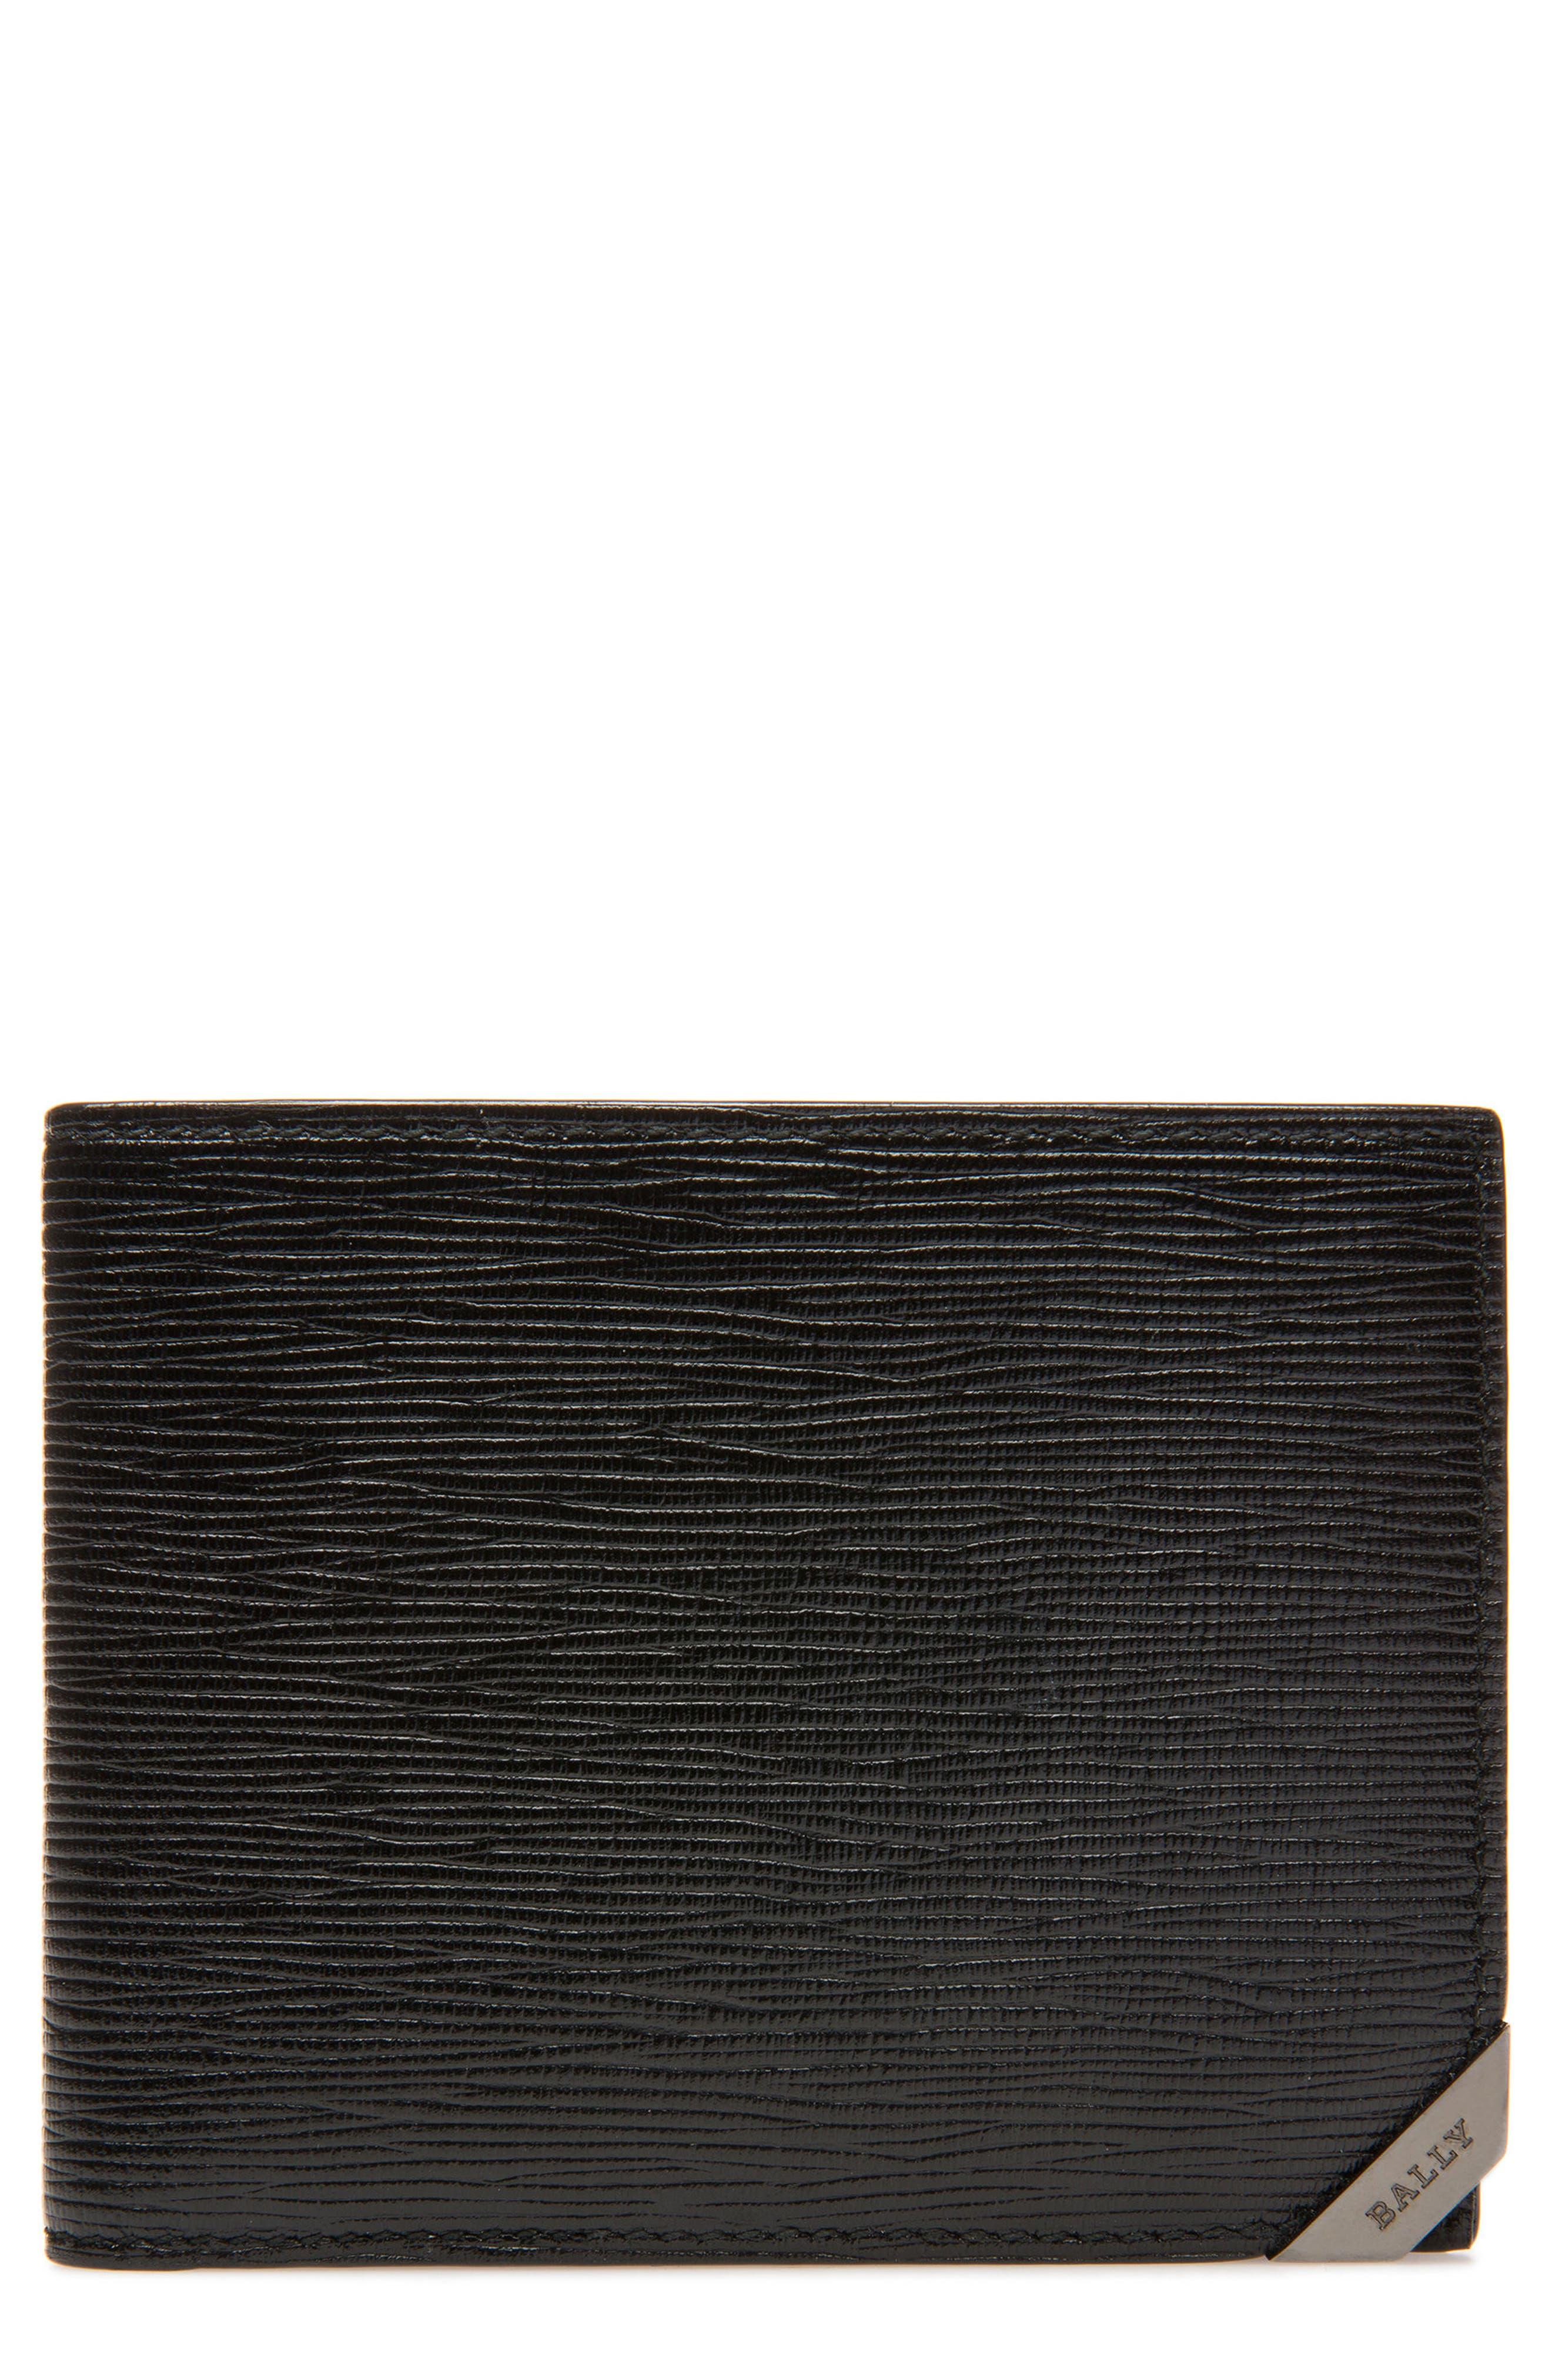 Bevye Leather Wallet,                         Main,                         color, Black